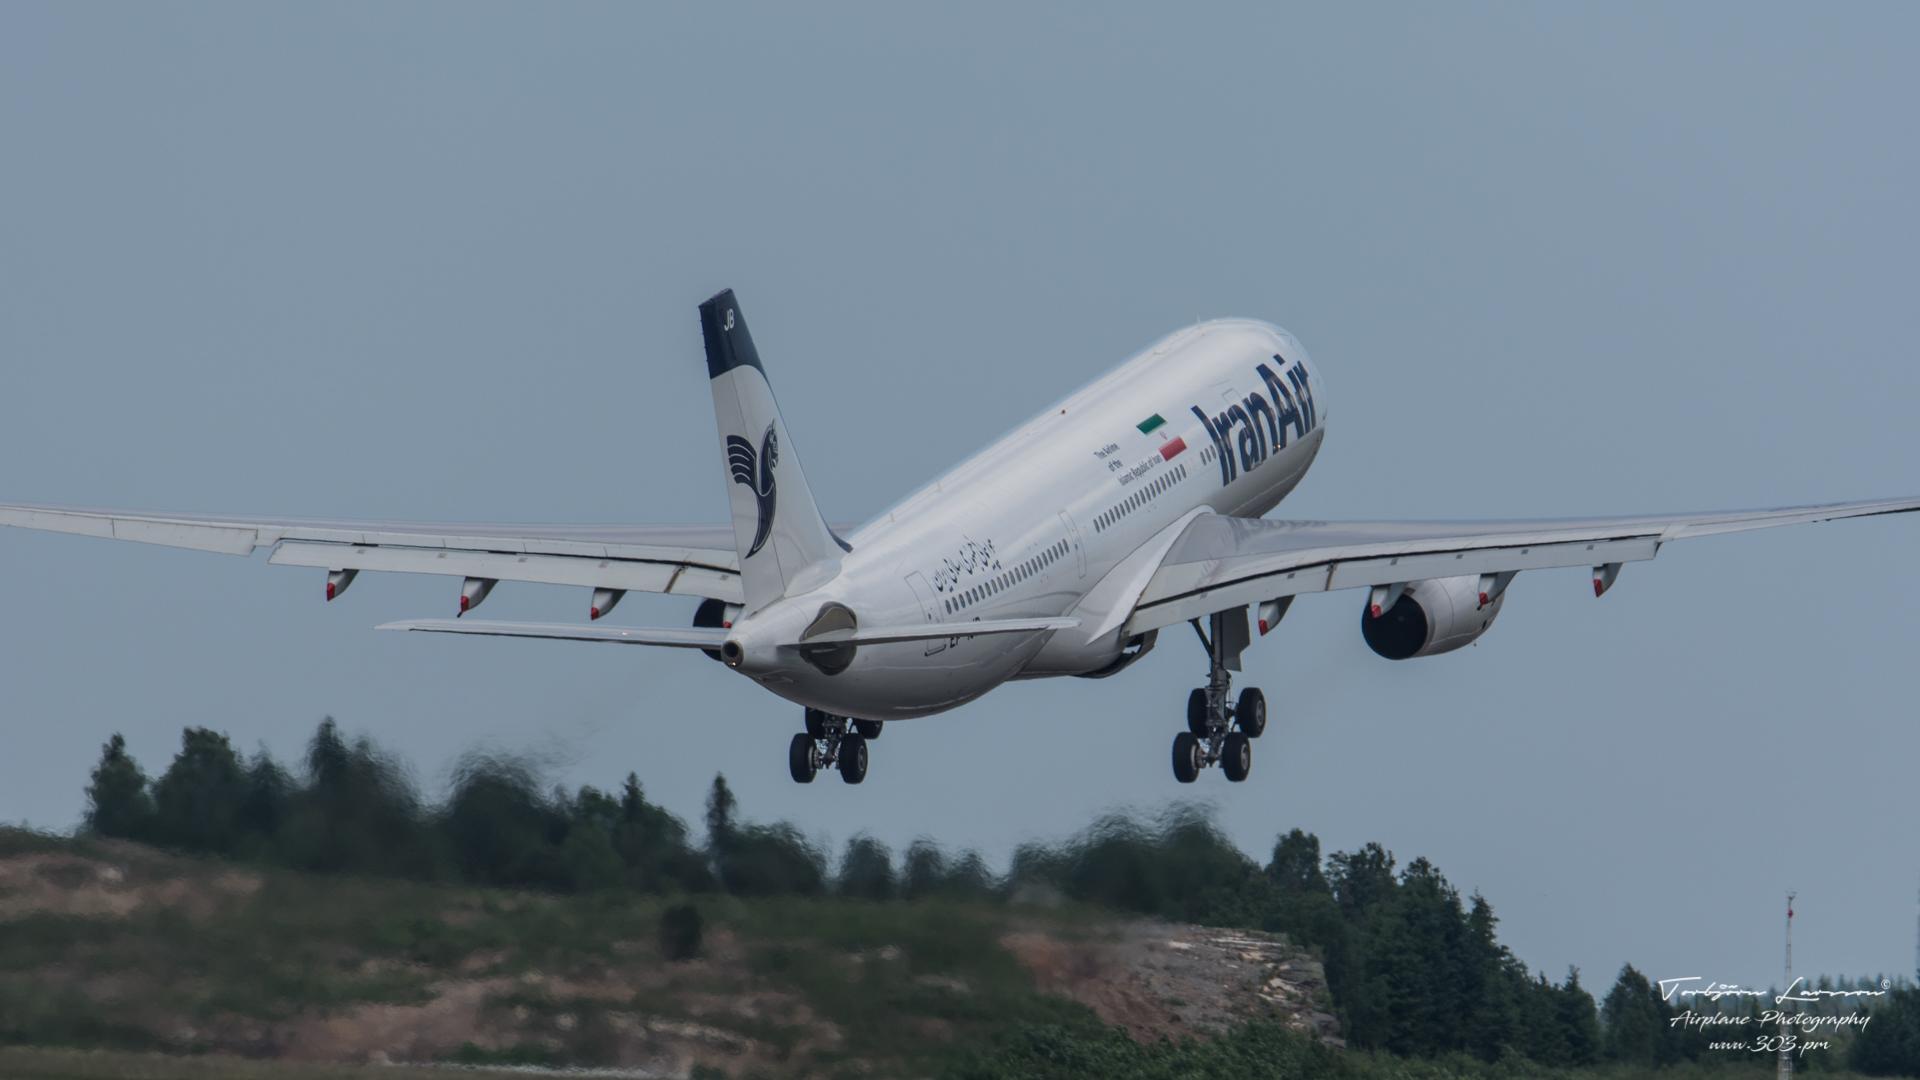 TBE_8649-Airbus A330-243 - Iran Air - (EP-IJB)